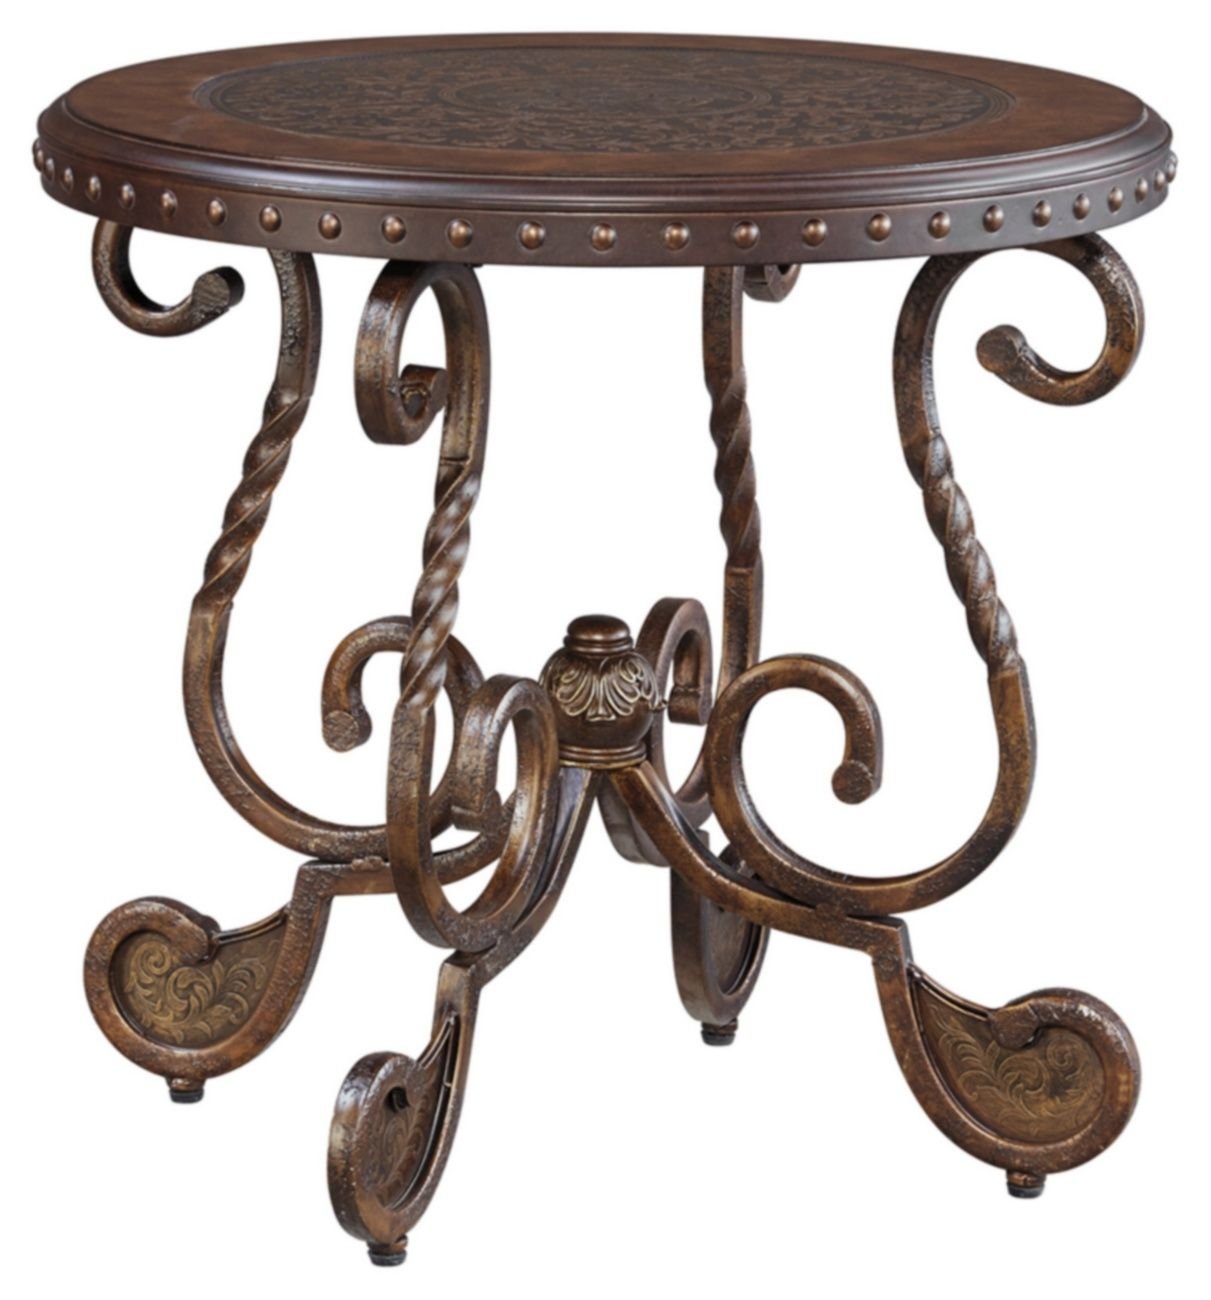 Signature Design Rafferty Round End Table Ashley Furniture T382 6